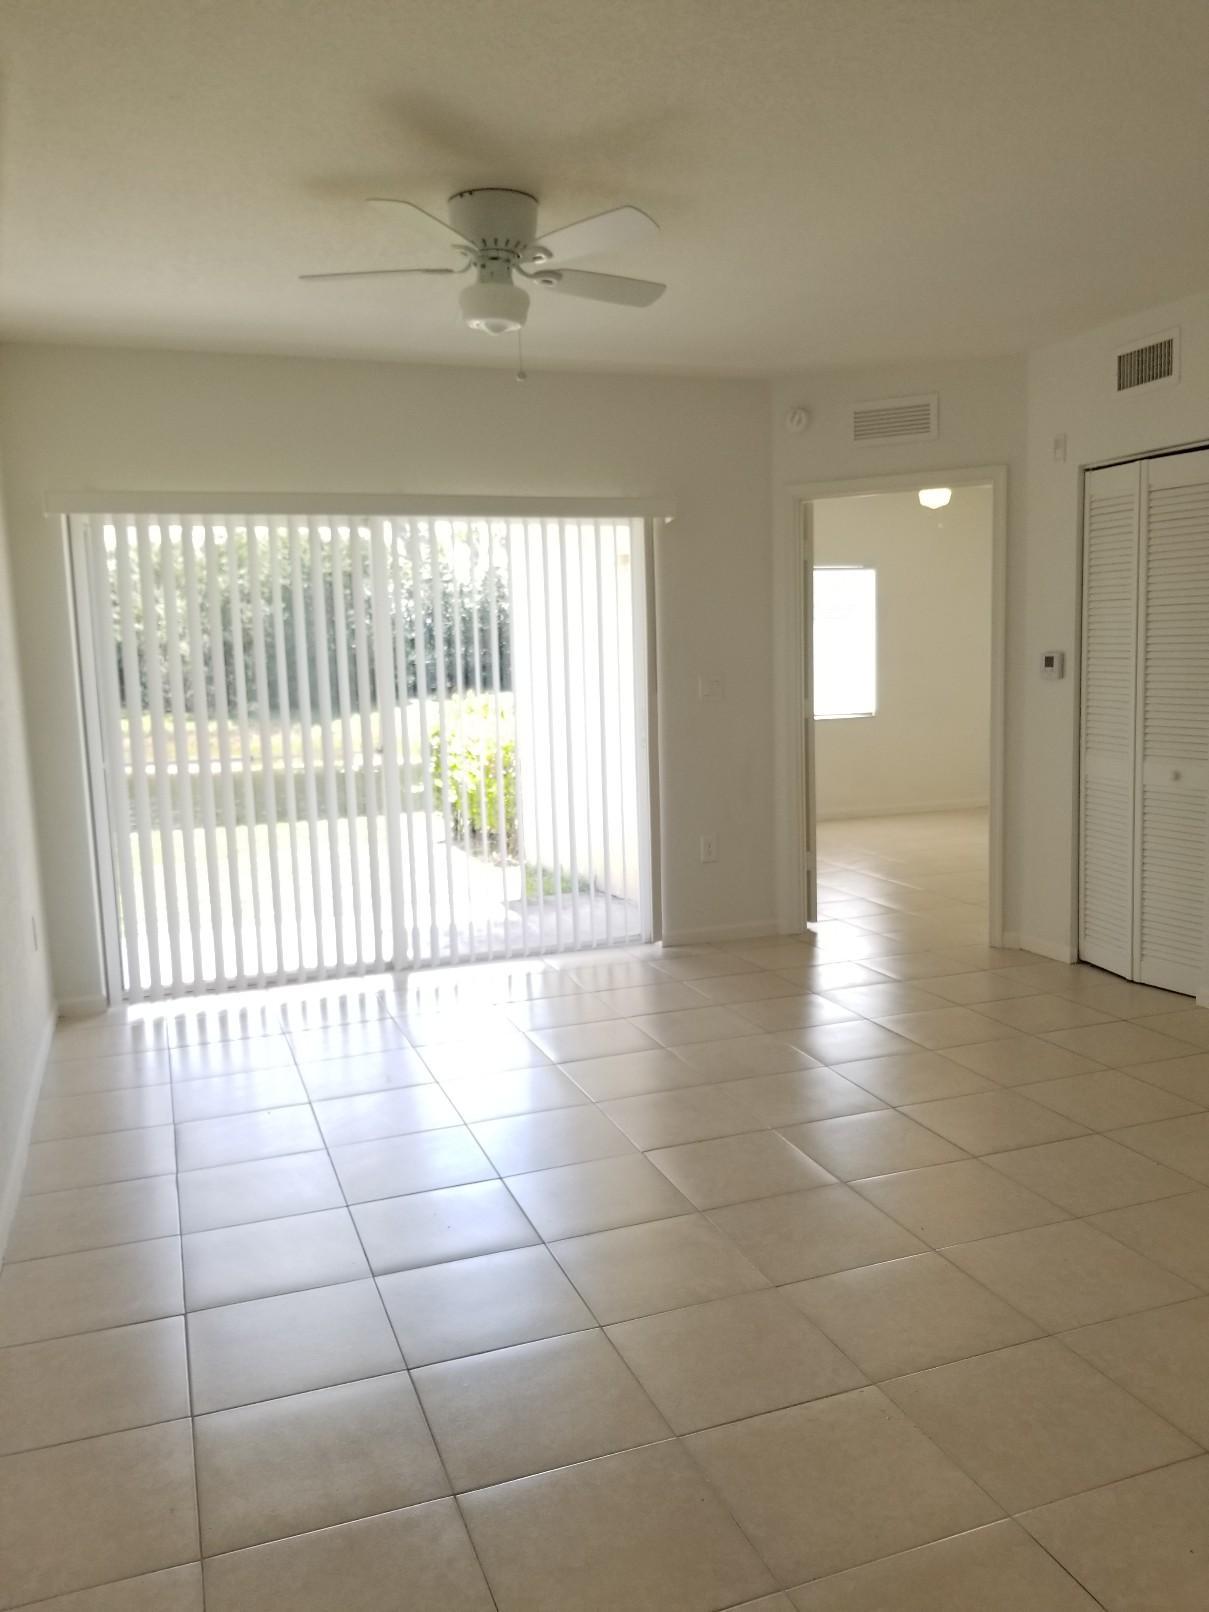 1063 Golden Lakes Boulevard,West Palm Beach,Florida 33411,3 Bedrooms Bedrooms,2 BathroomsBathrooms,Condo/coop,Golden Lakes,RX-10610353